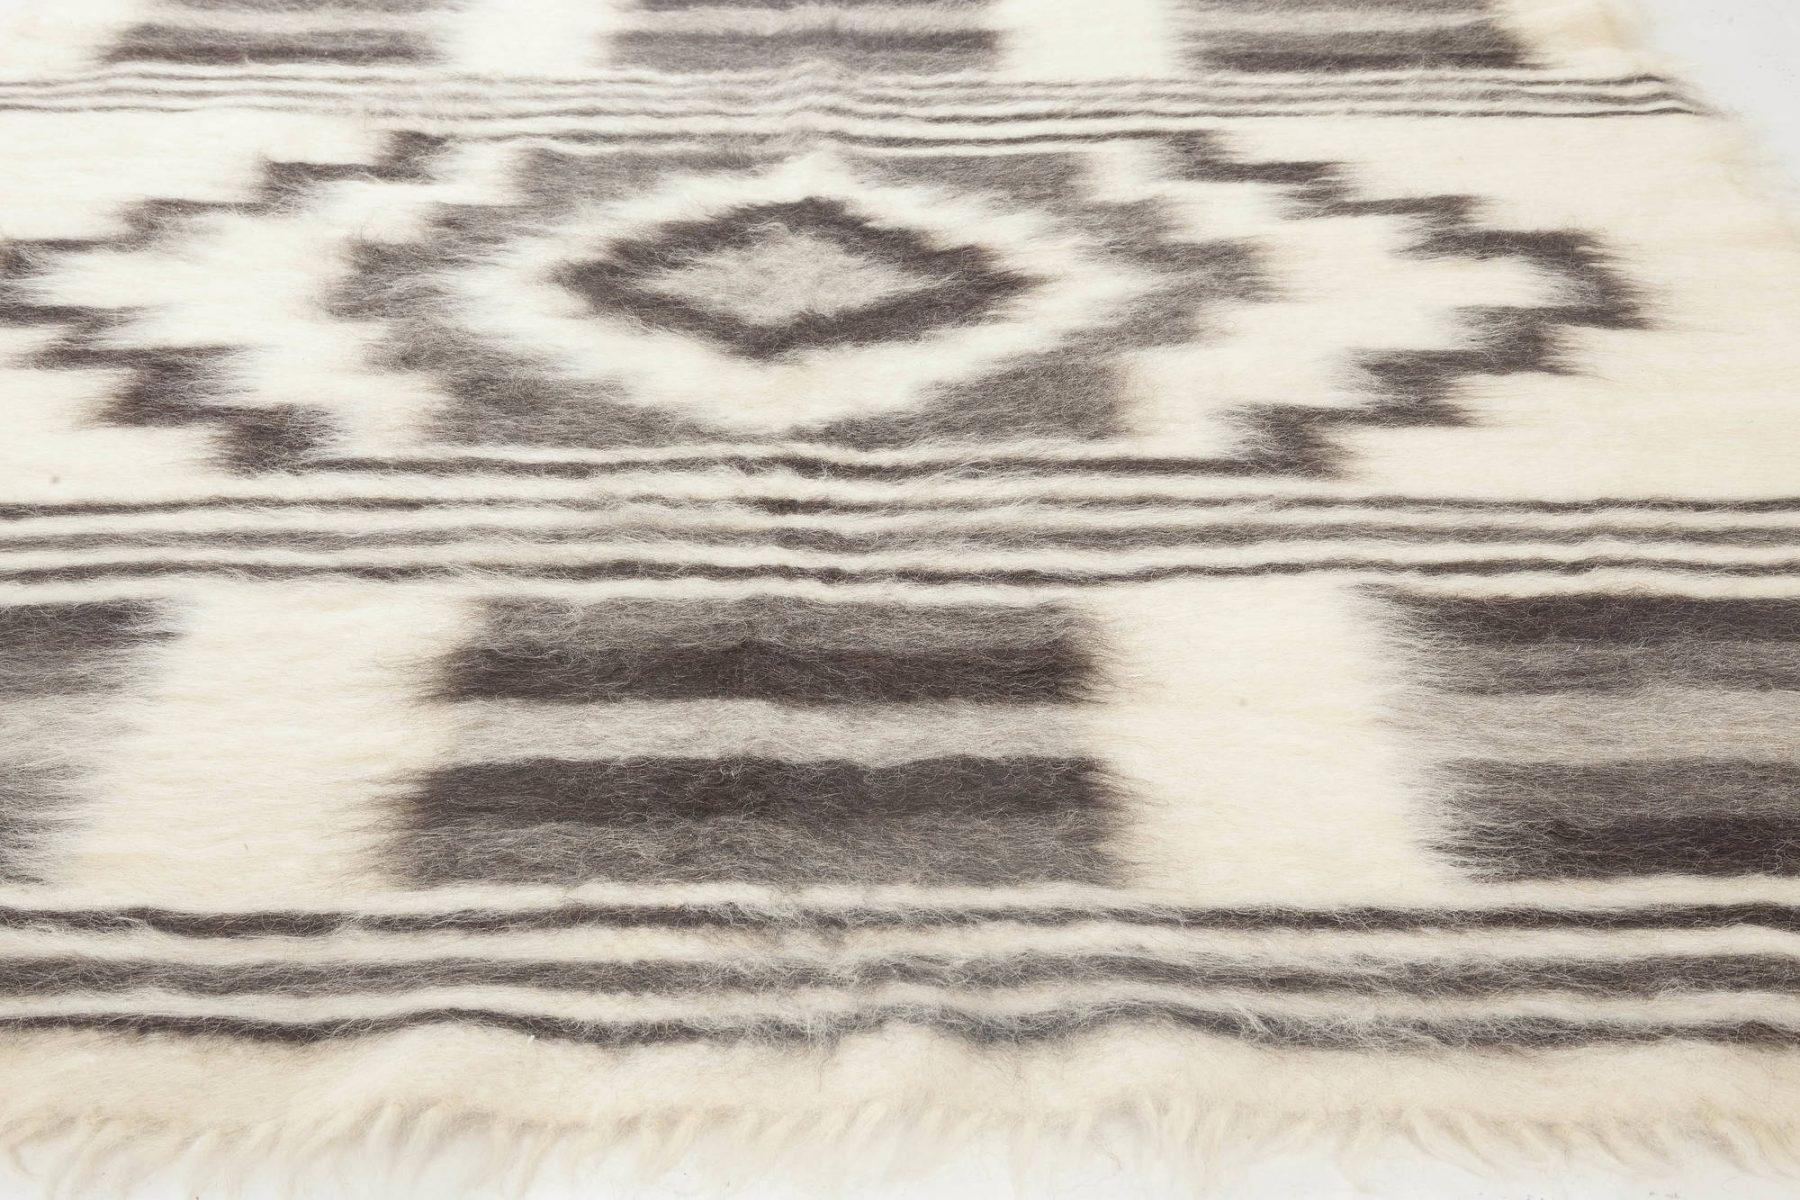 Stamverband VI Geometric Gray, White and Black Wool Rug N11832